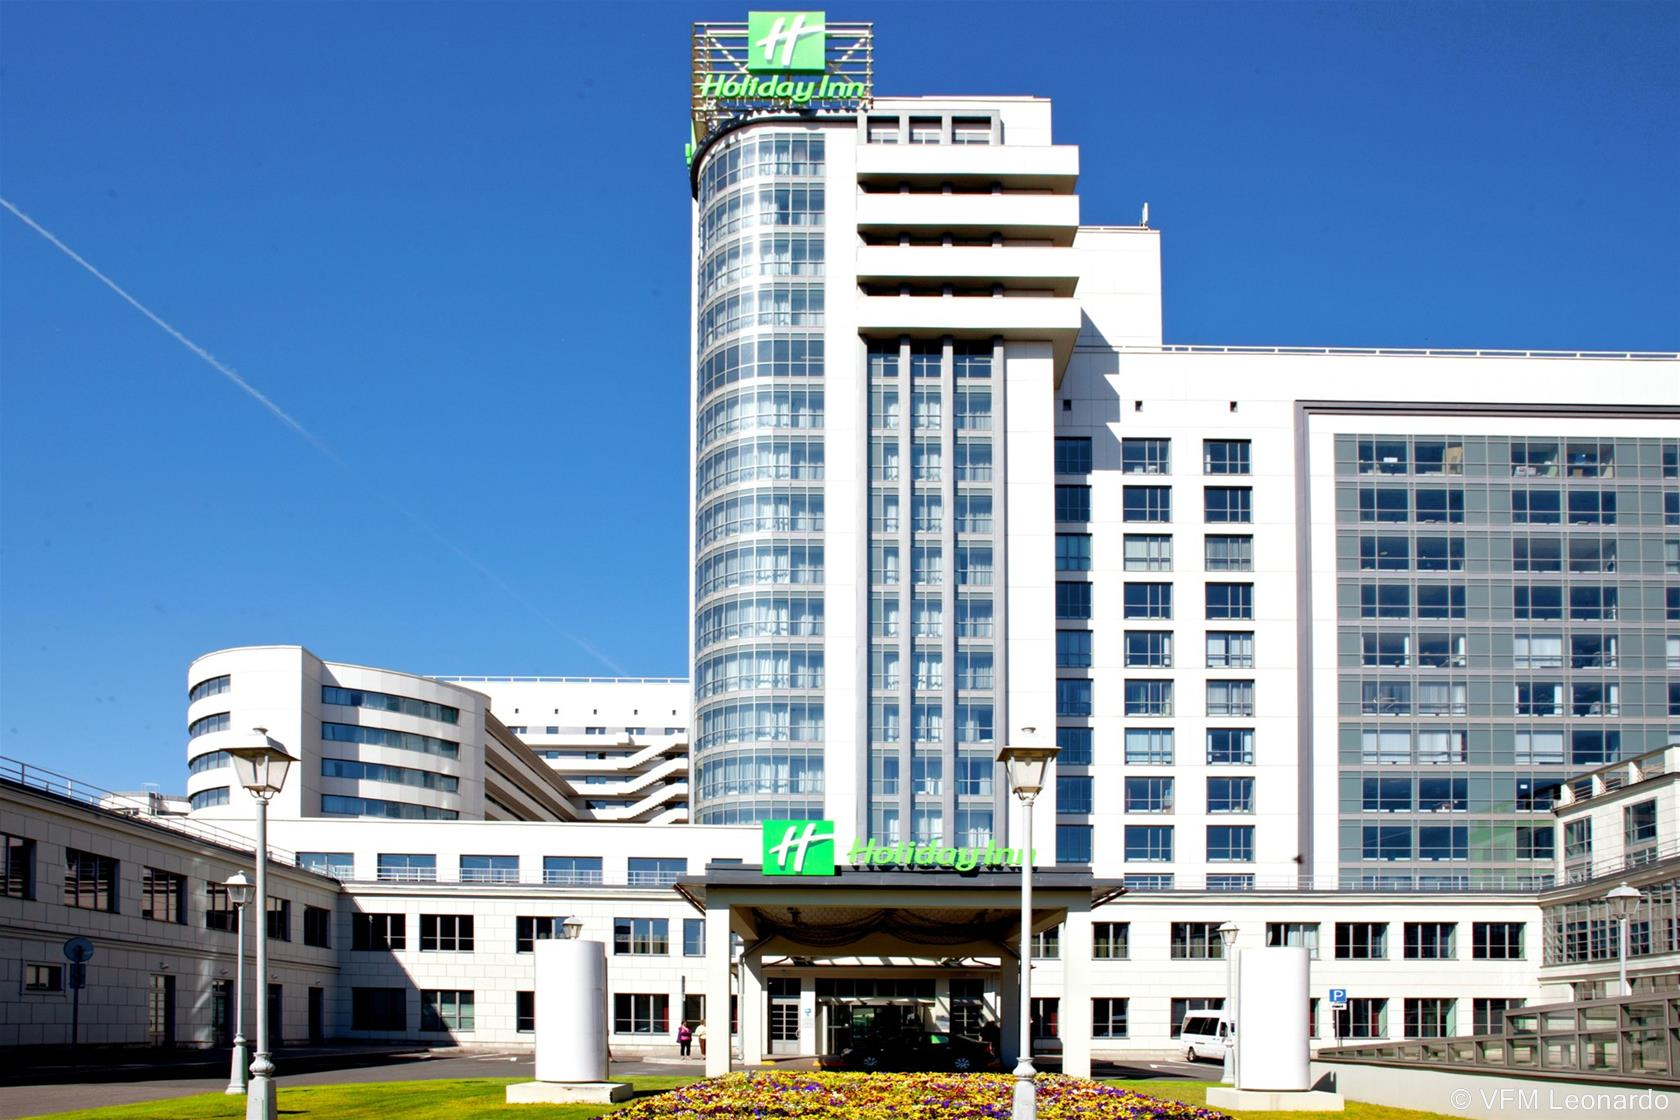 Holiday Inn St. Petersburg Moskovskye Vorota